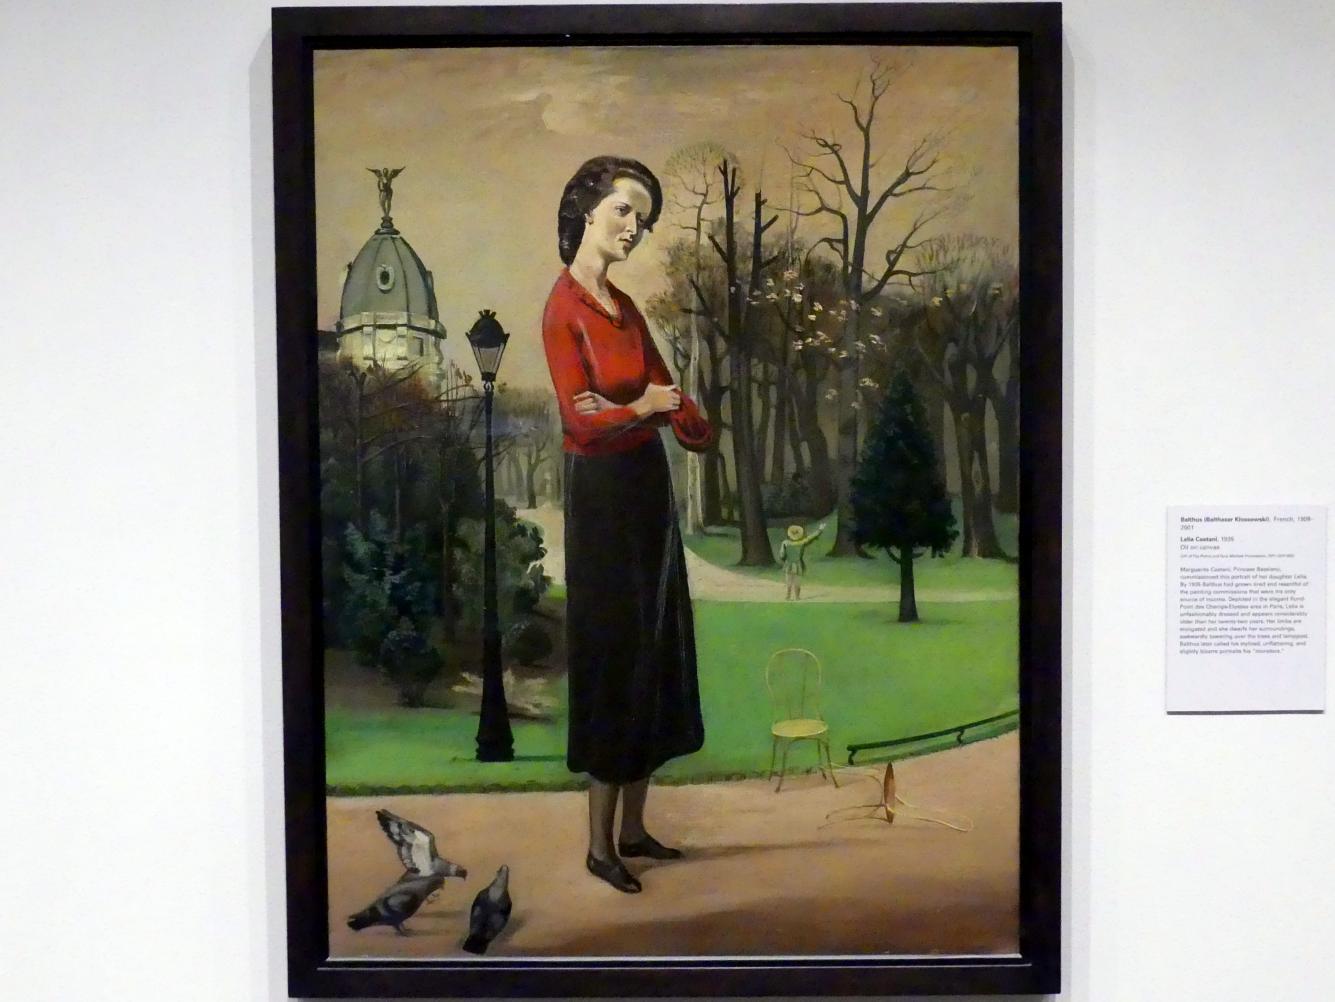 Balthus (Balthasar Kłossowski de Rola): Lelia Caetani, 1935